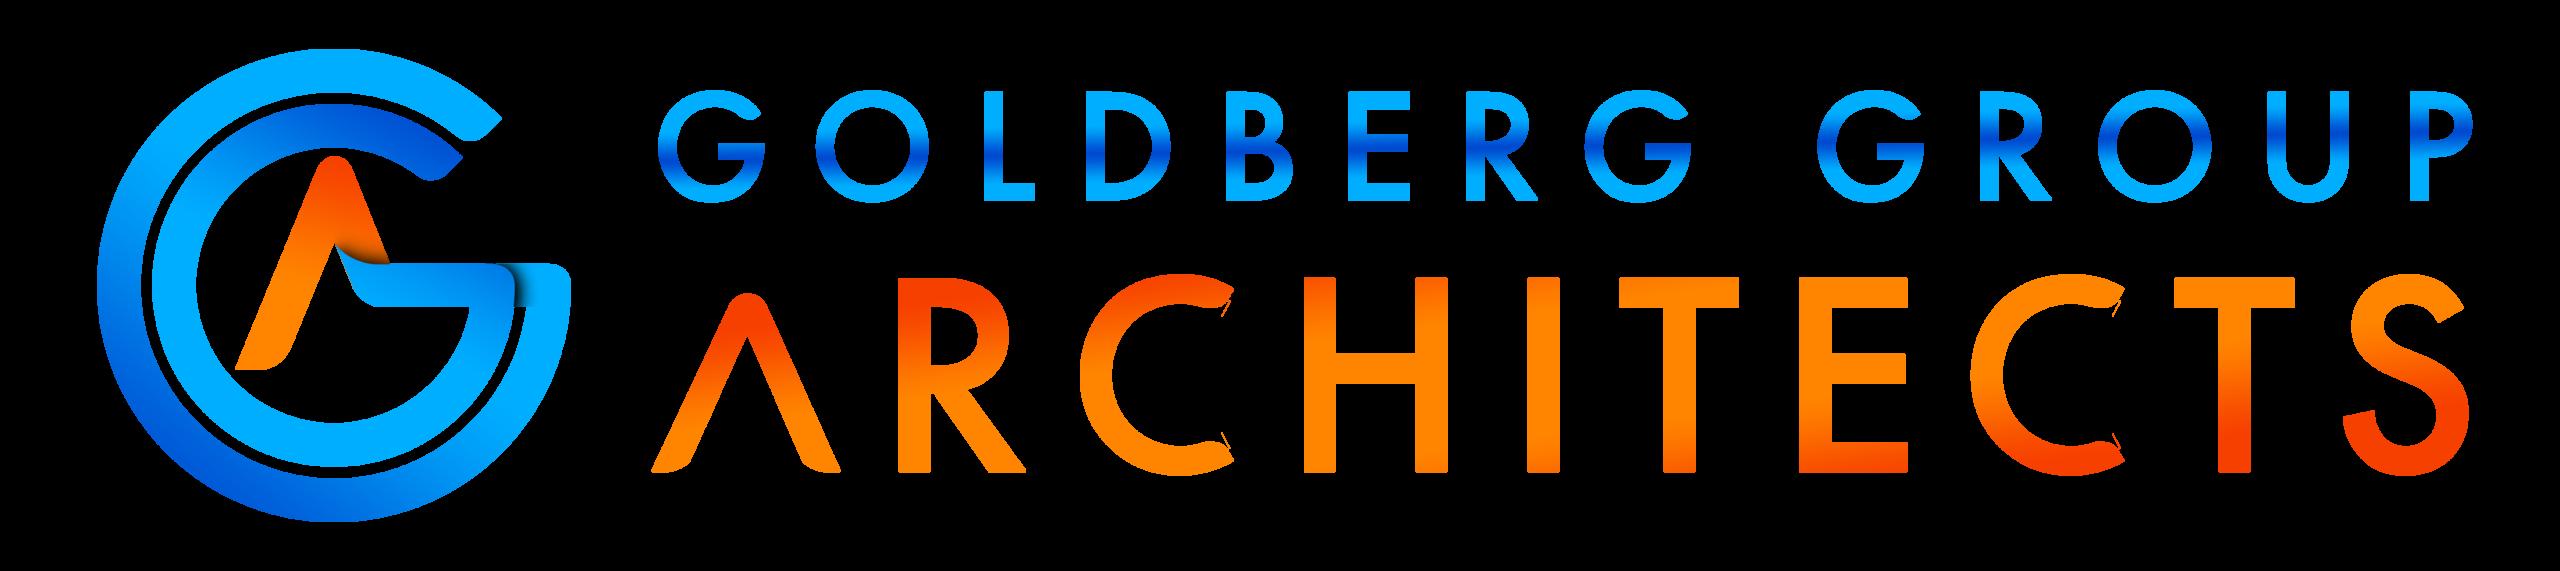 Goldberg Group Architects